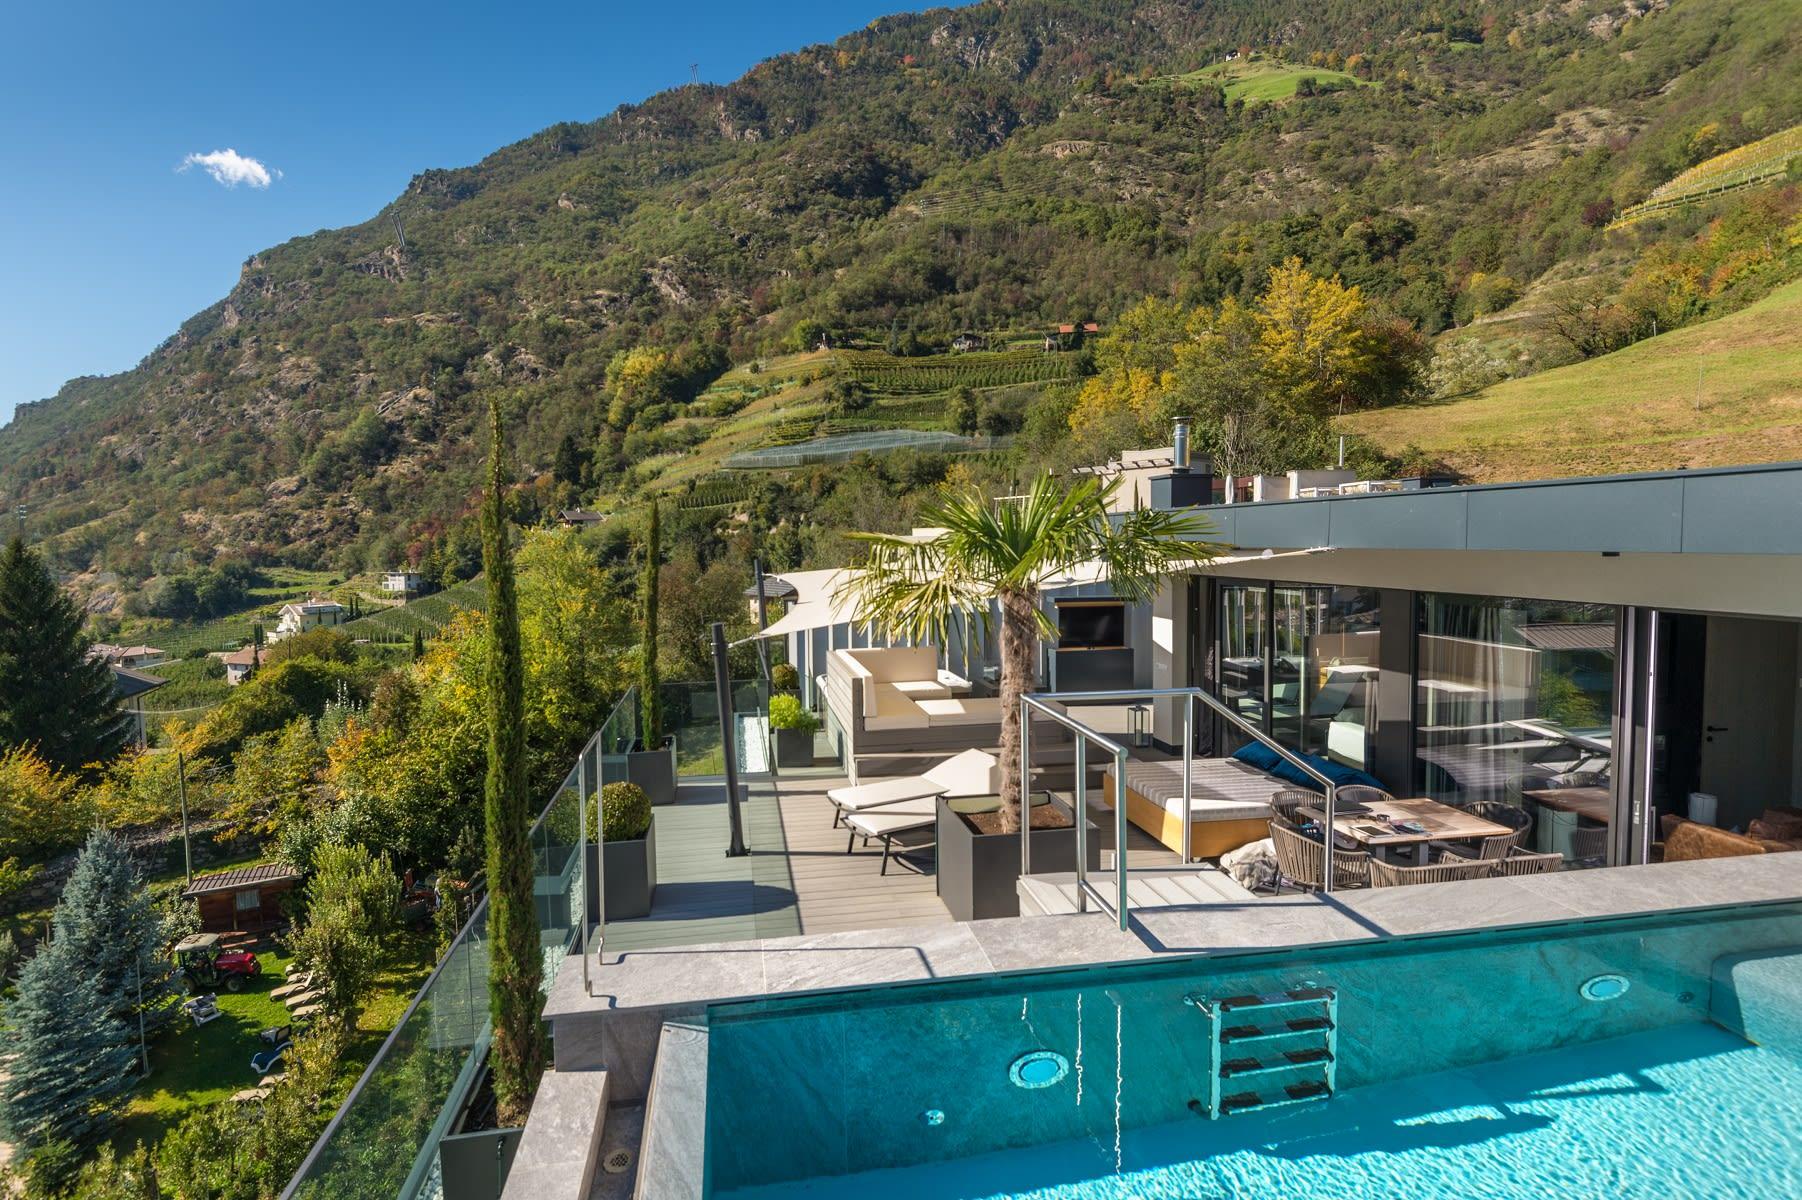 Penthouse Suite DolceVita Premium terrazza